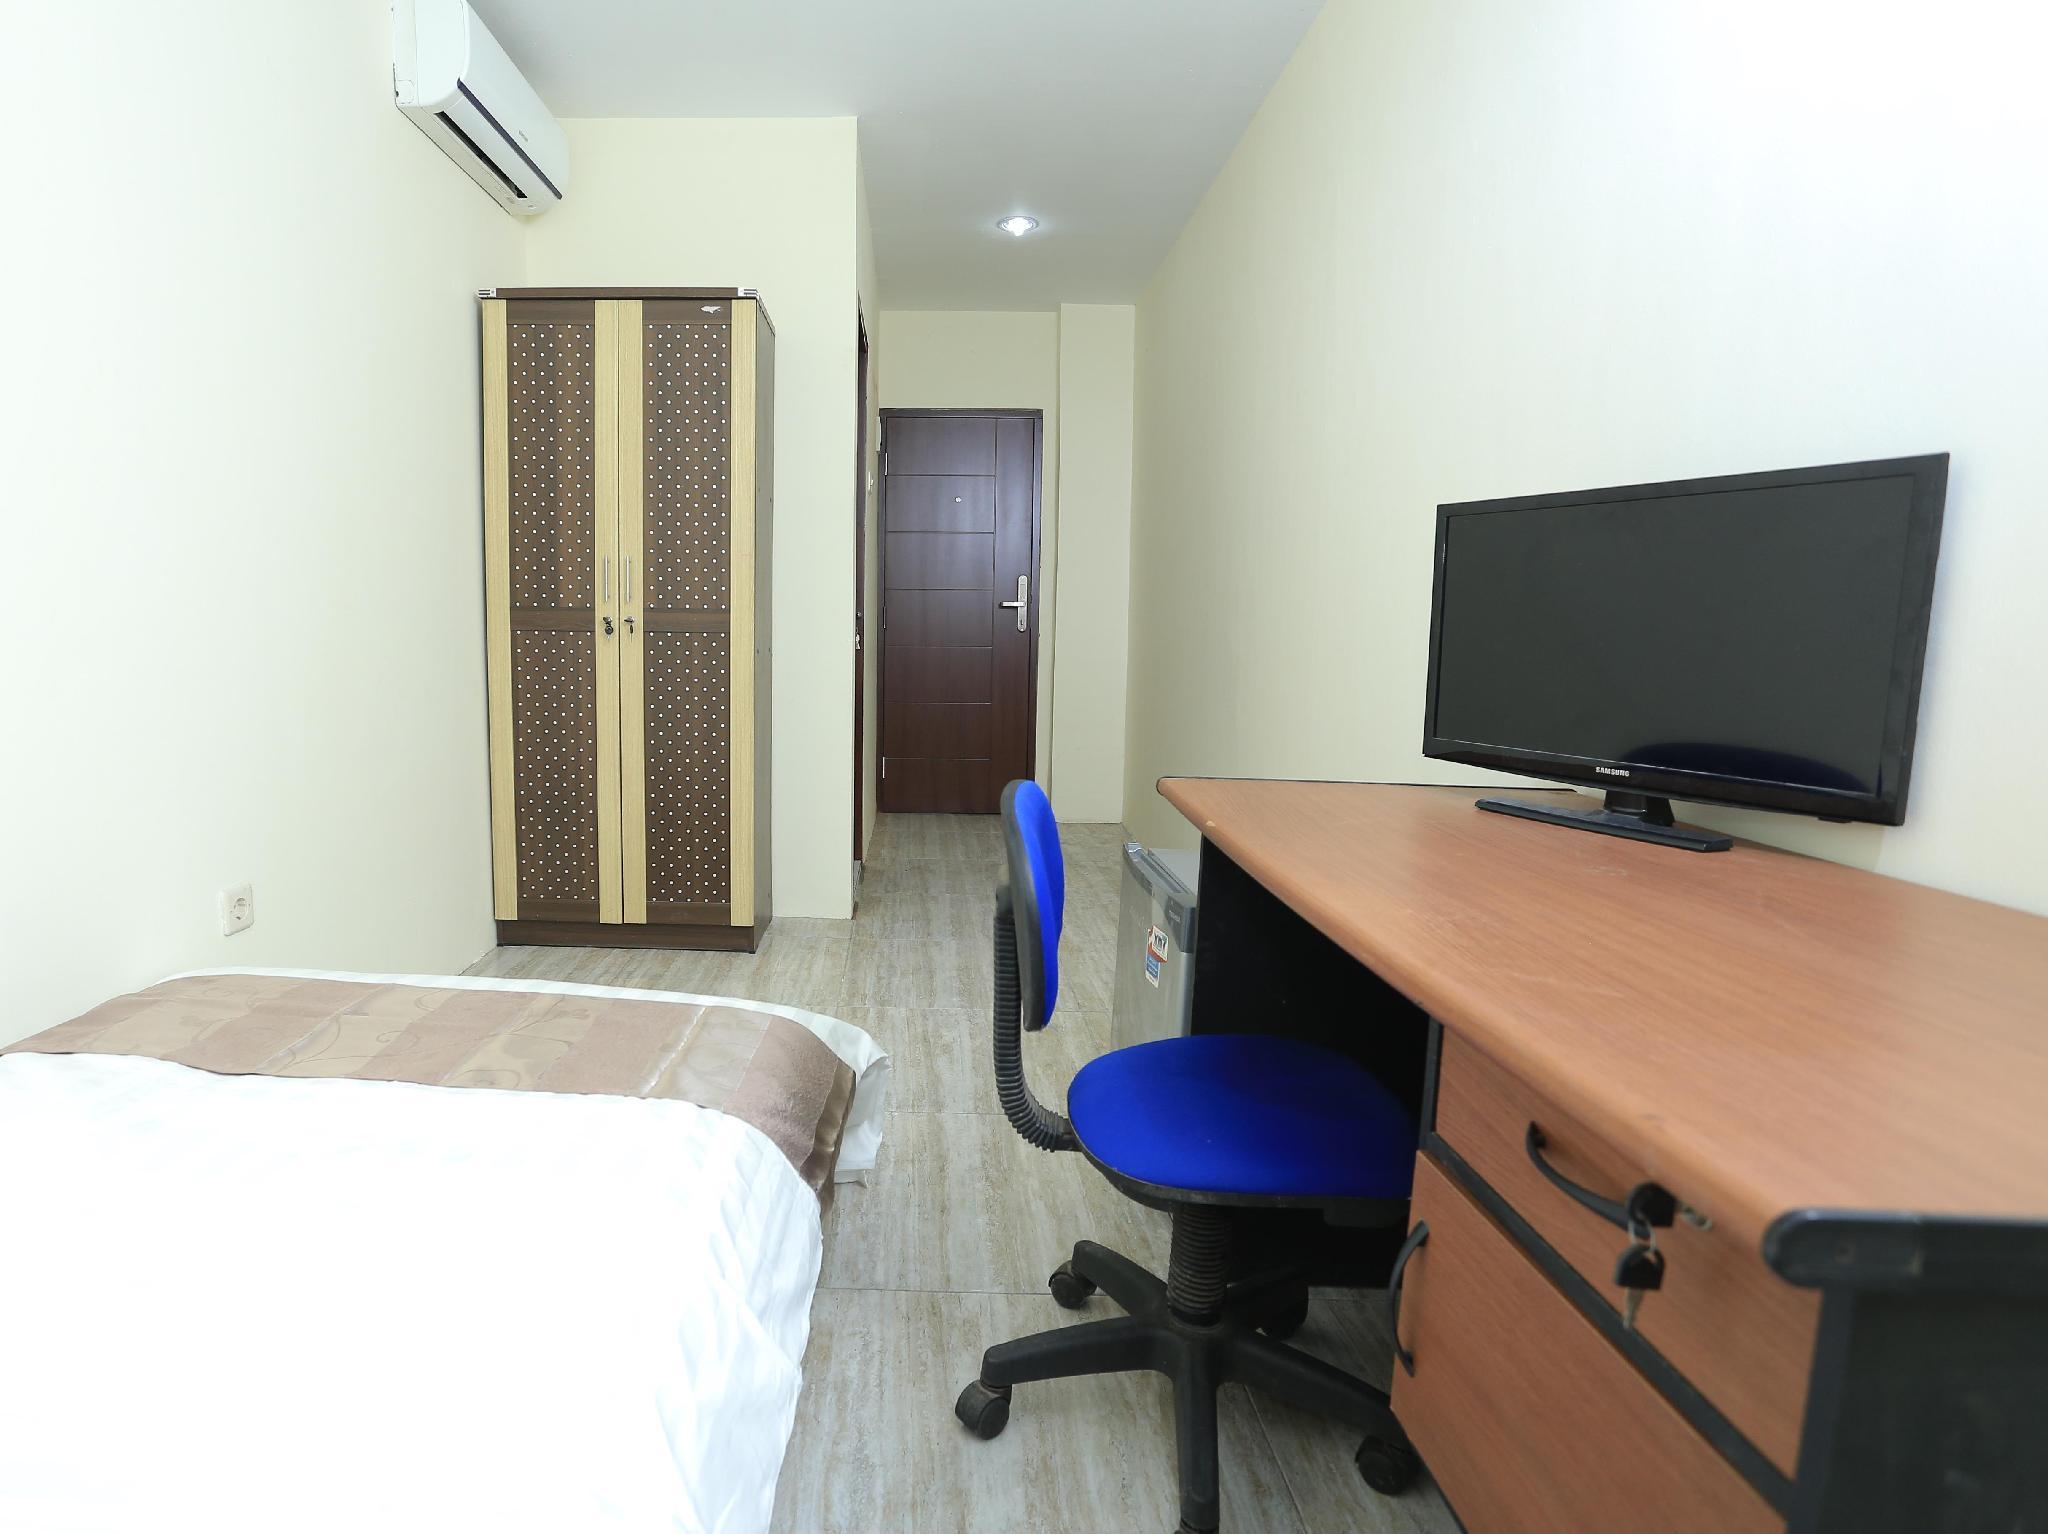 Hotel Siliwangi Residence - Jalan Jenderal Sudirman 187-189, Siliwangi Plaza F4-5 - Semarang